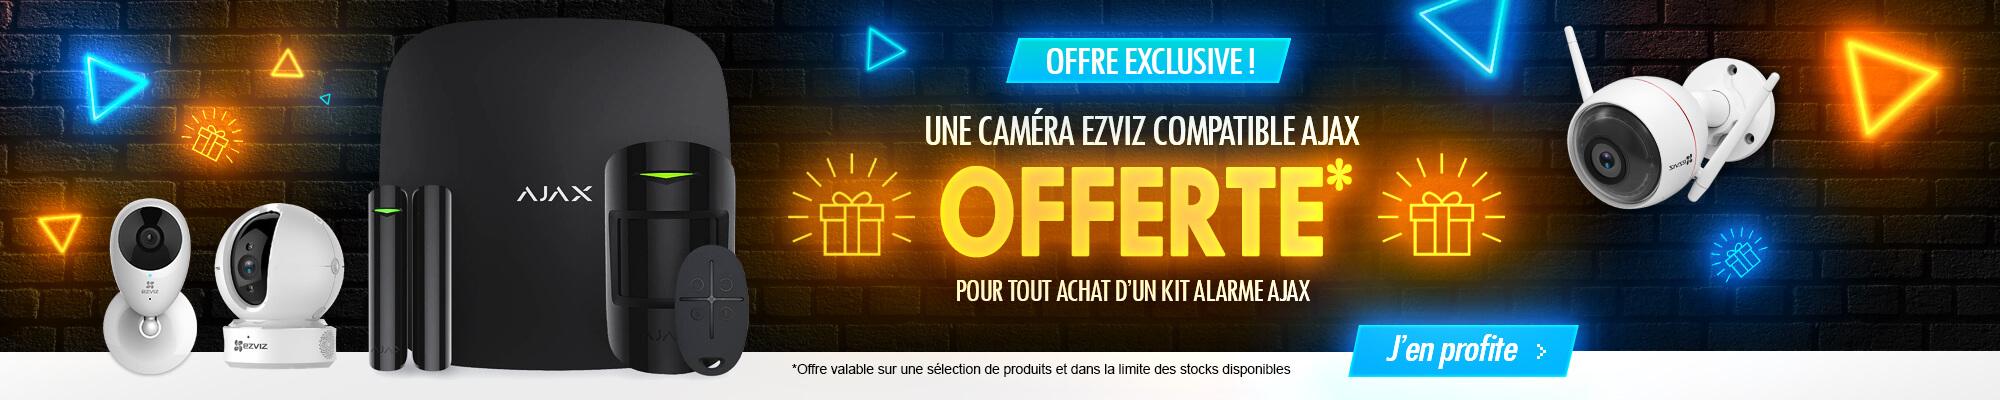 Une caméra Ezviz offerte avec votre pack alarme Ajax